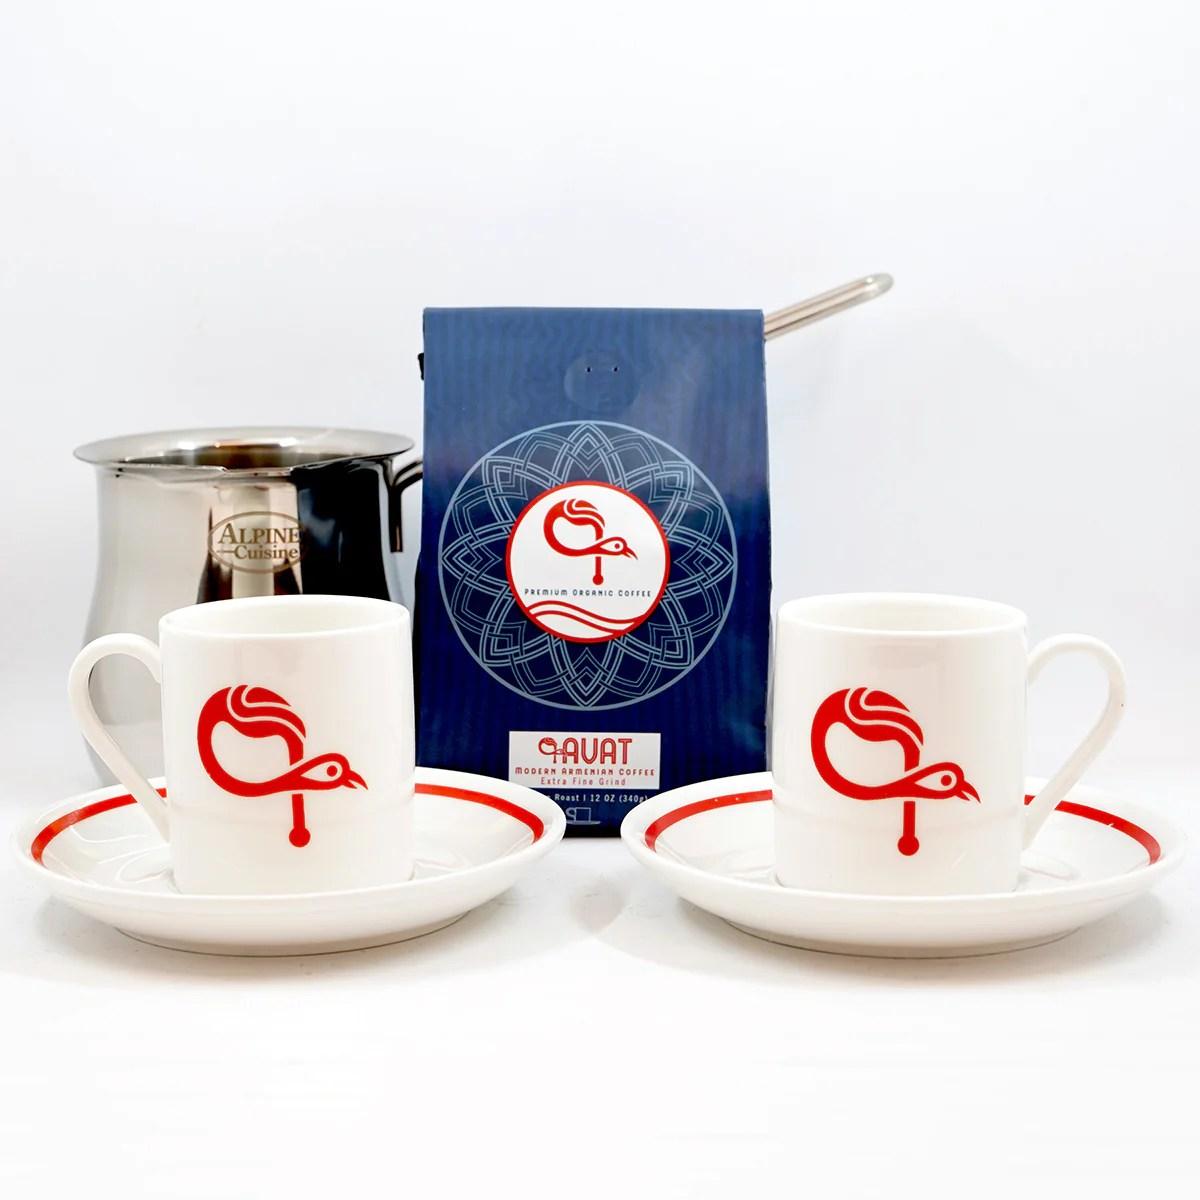 armenian coffee starter set gift pack signature Õ£avat coffee cups